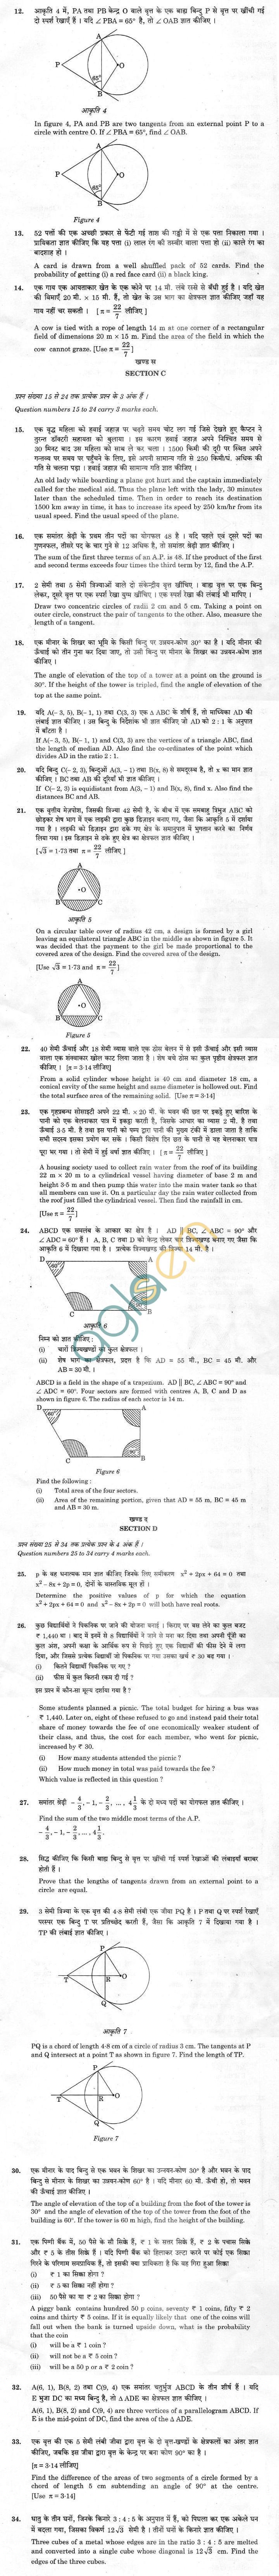 CBSE Compartment Exam 2013 Class X Question Paper -Mathematics